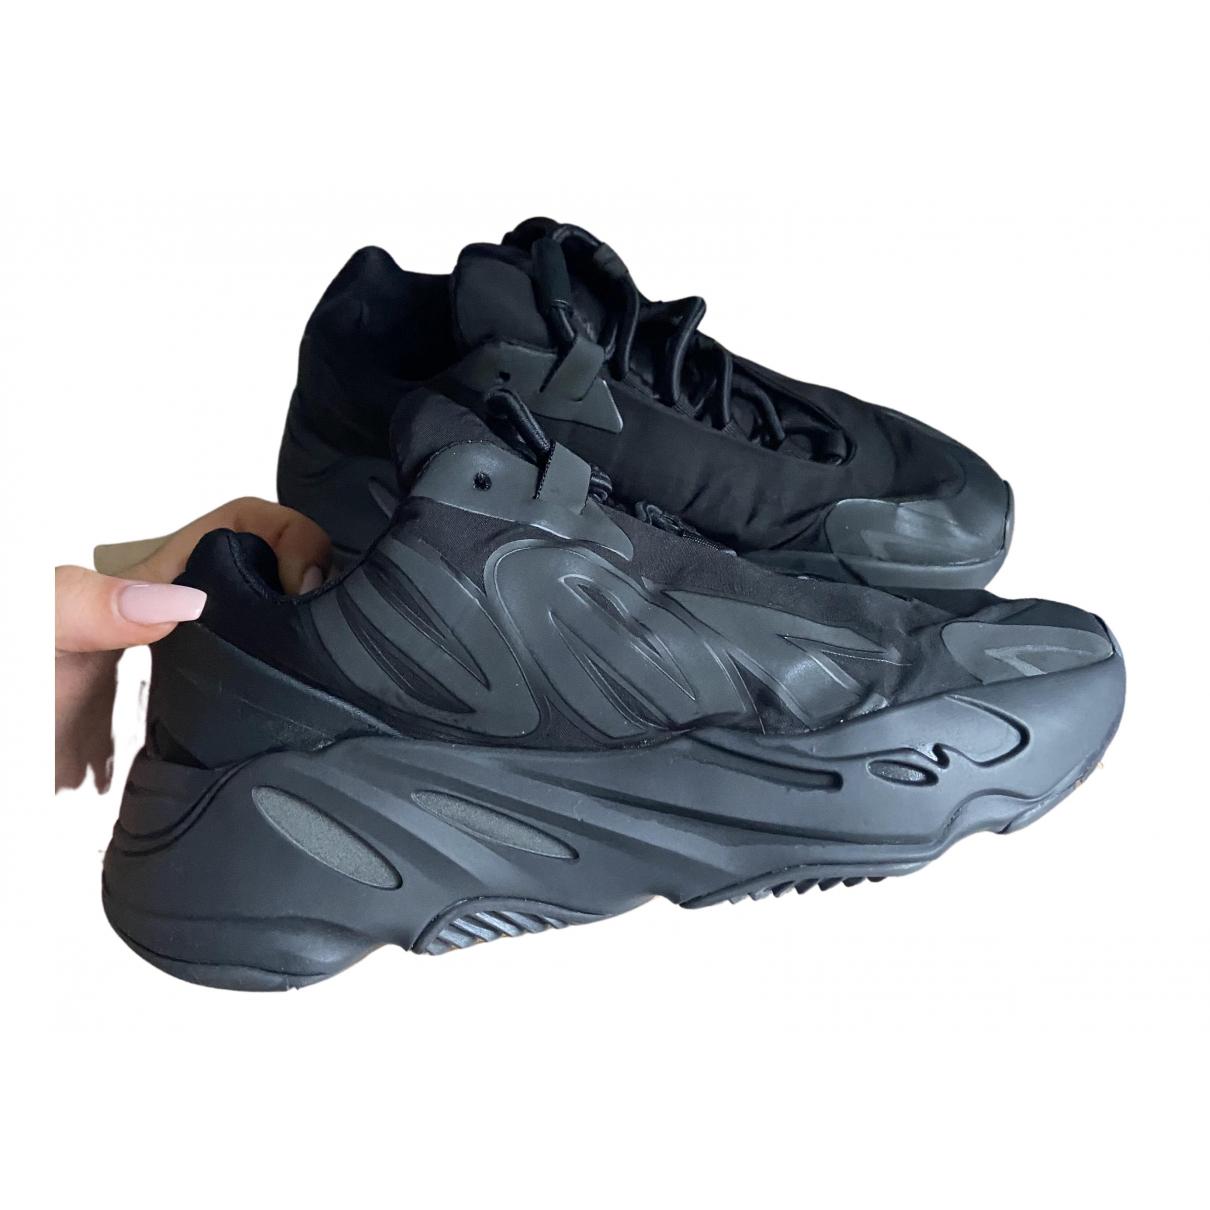 Yeezy X Adidas - Baskets 700 MNVN PHOSPHOR pour femme - noir